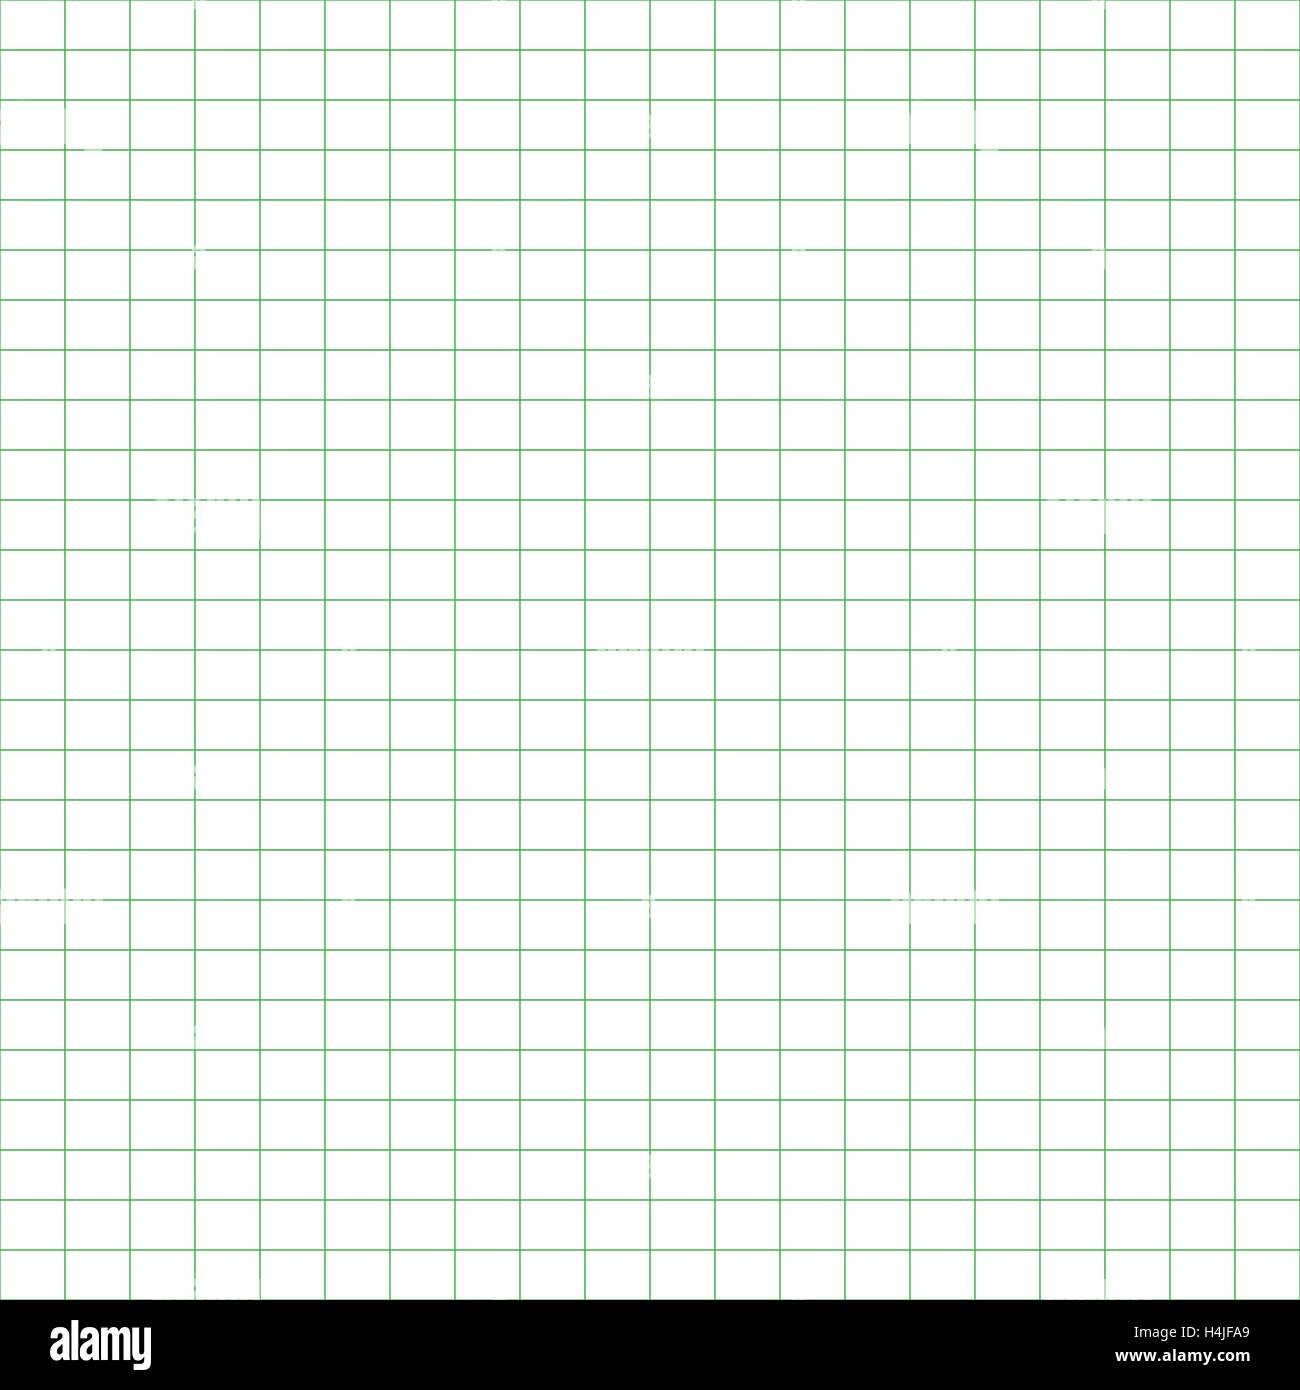 Gitter, Netz, Grafik, Millimeter-Papier-Muster (wiederholbar Vektor ...